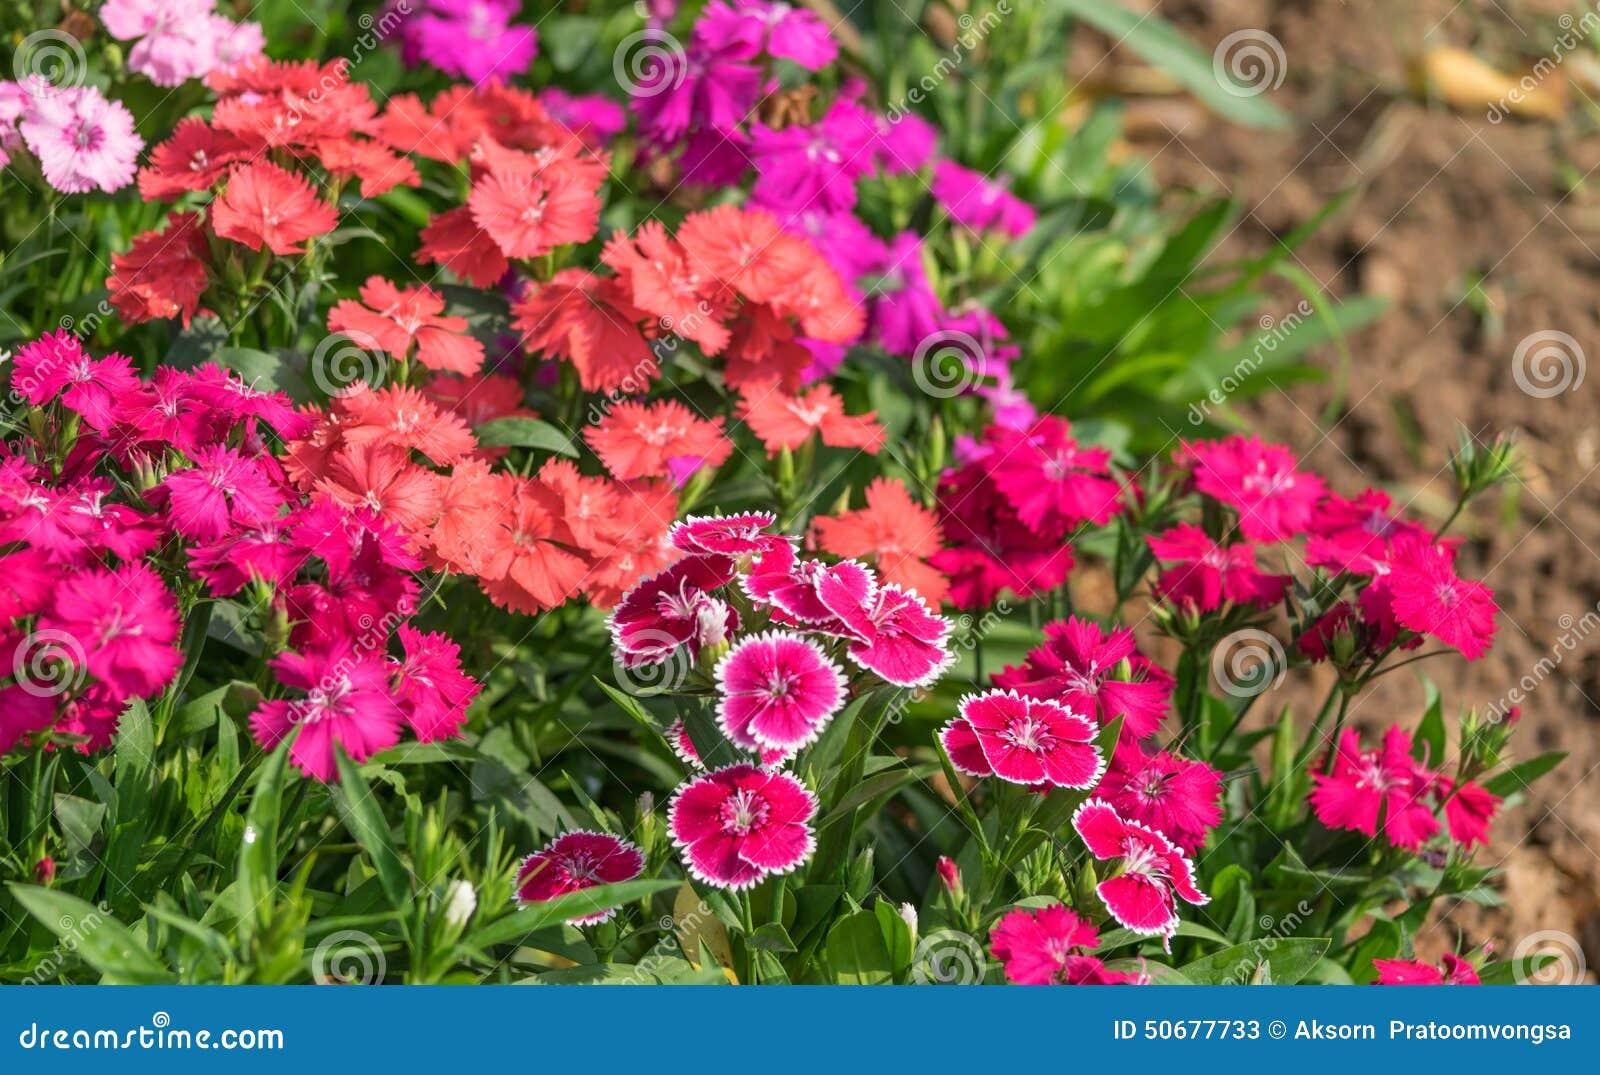 Download 石竹中华的花 库存图片. 图片 包括有 五颜六色, 四季不断, 庭院, 绿色, 精美, 详细资料, 雏菊 - 50677733